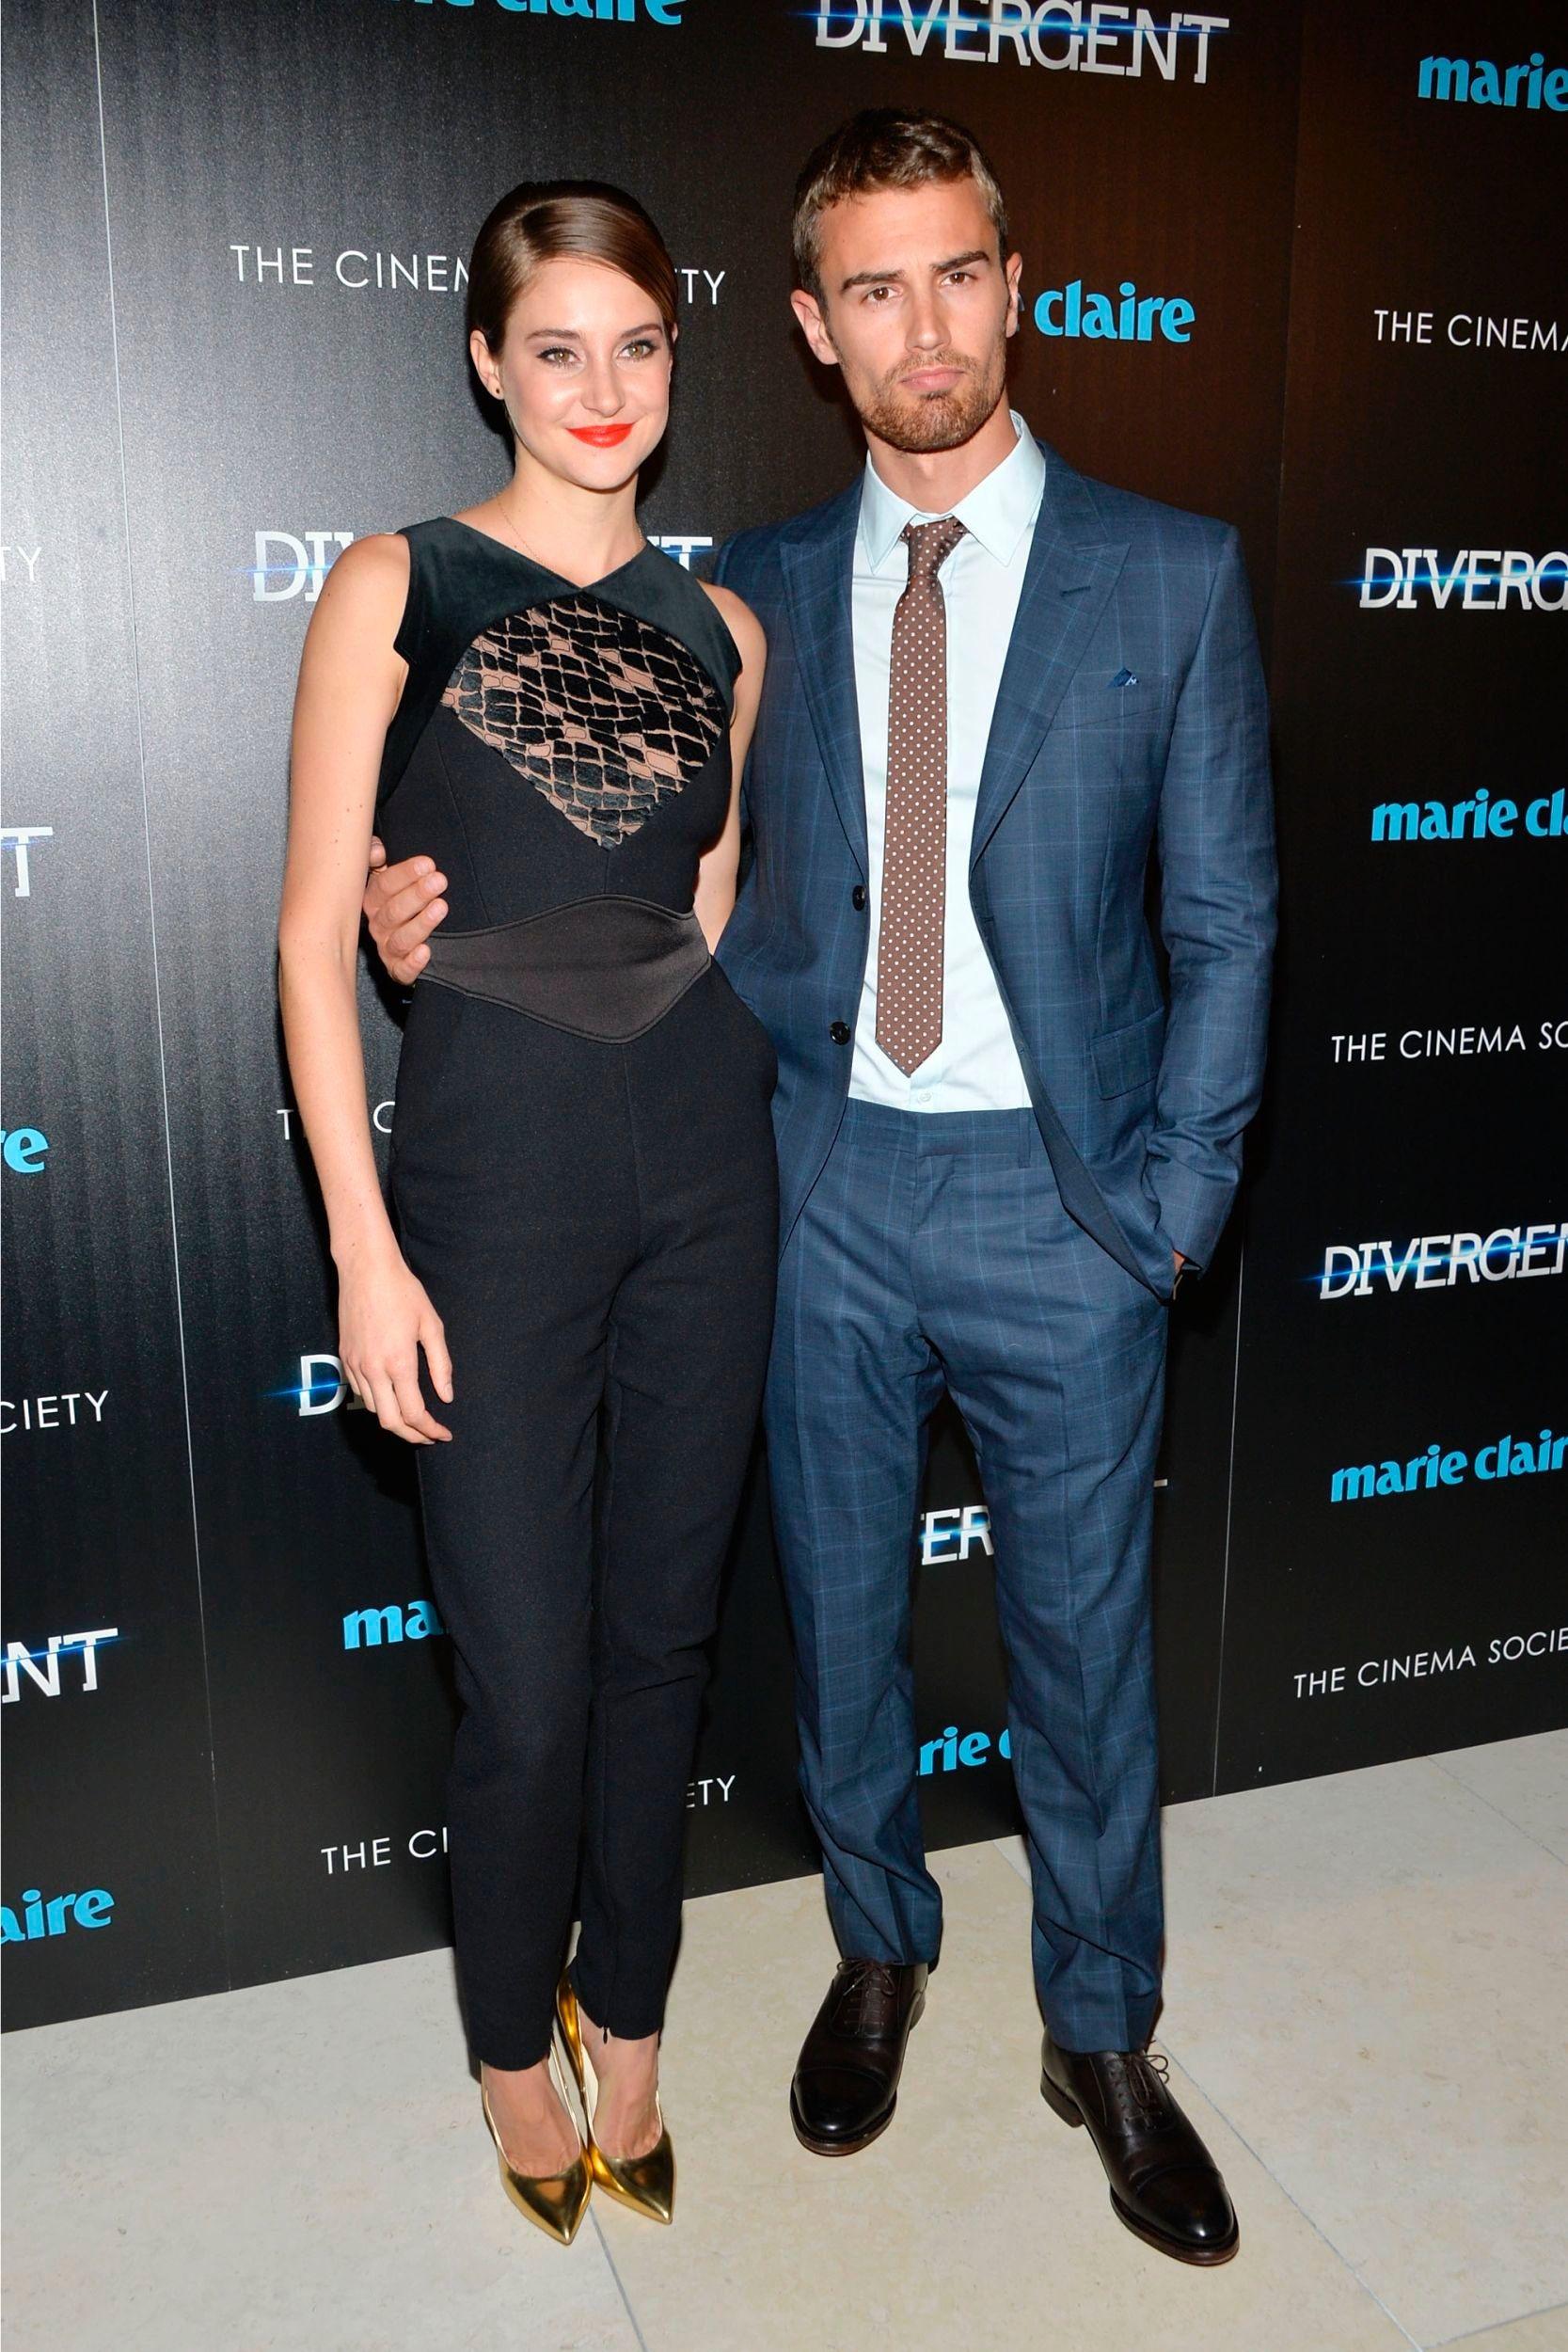 Shailene Woodley & Theo James | DIVERGENT | Pinterest